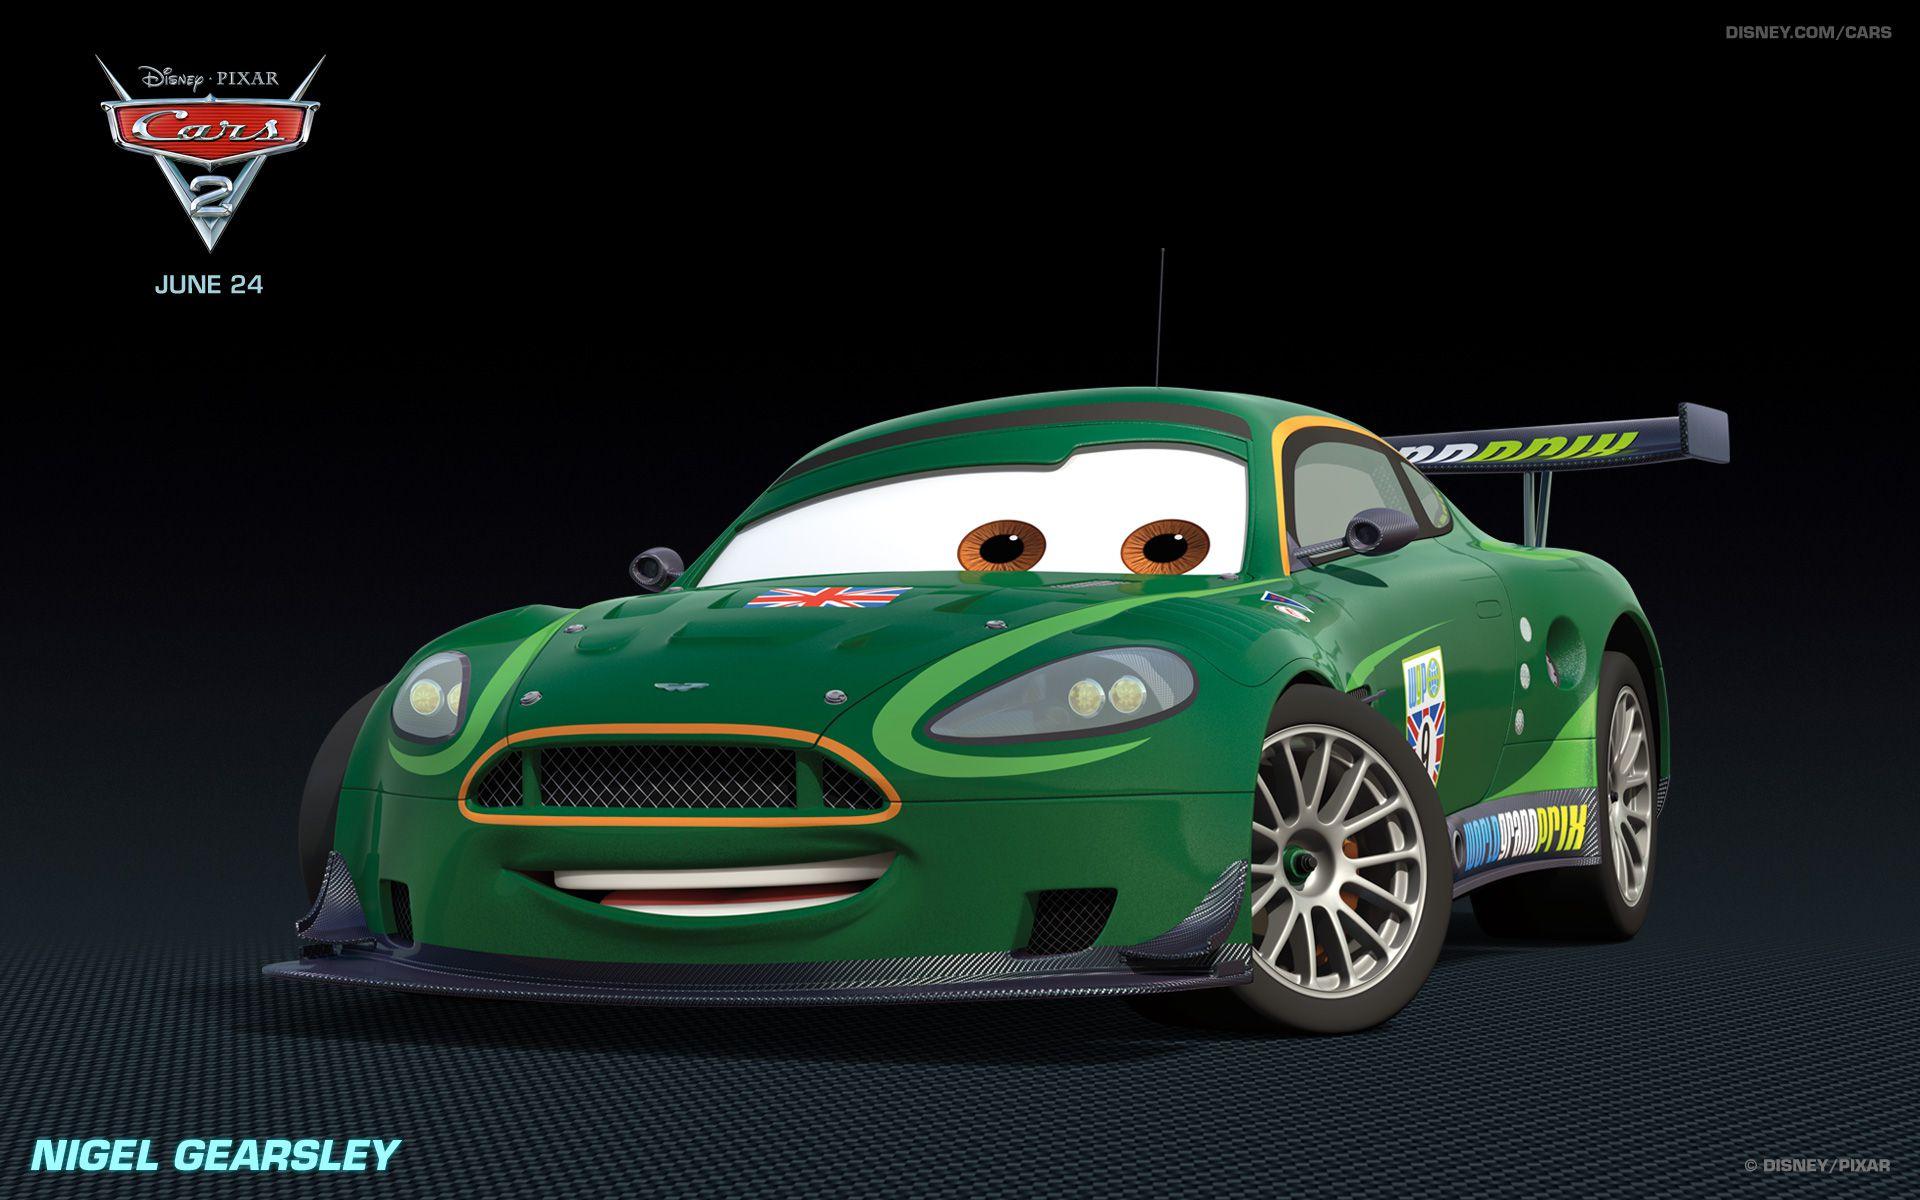 Exotic Cars in Pixar s Cars 2